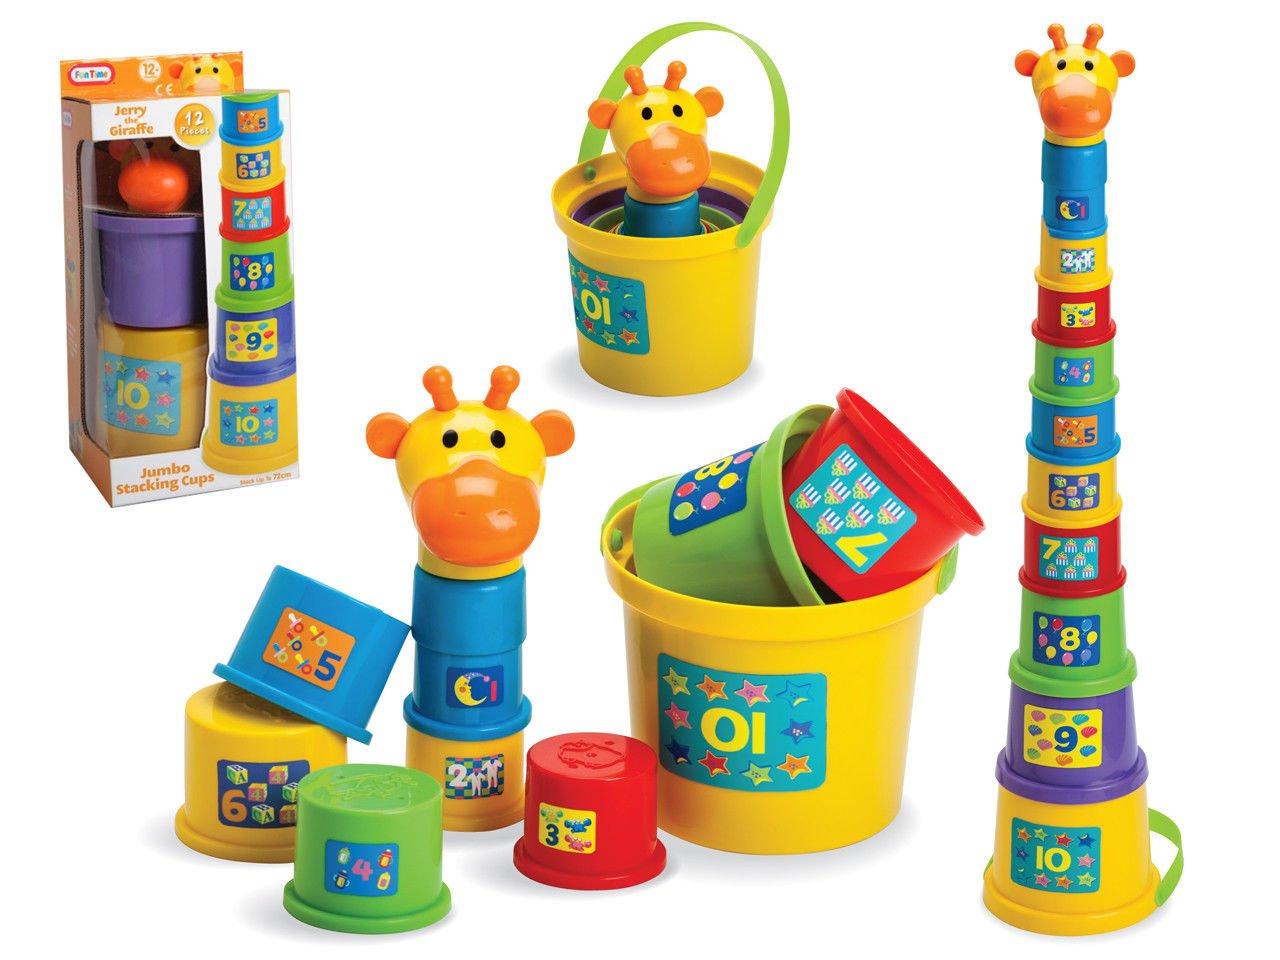 dd3bfa88cbbf Gerry The Giraffe Baby Toddler Stacking Nesting Sorting Cups Blocks ...